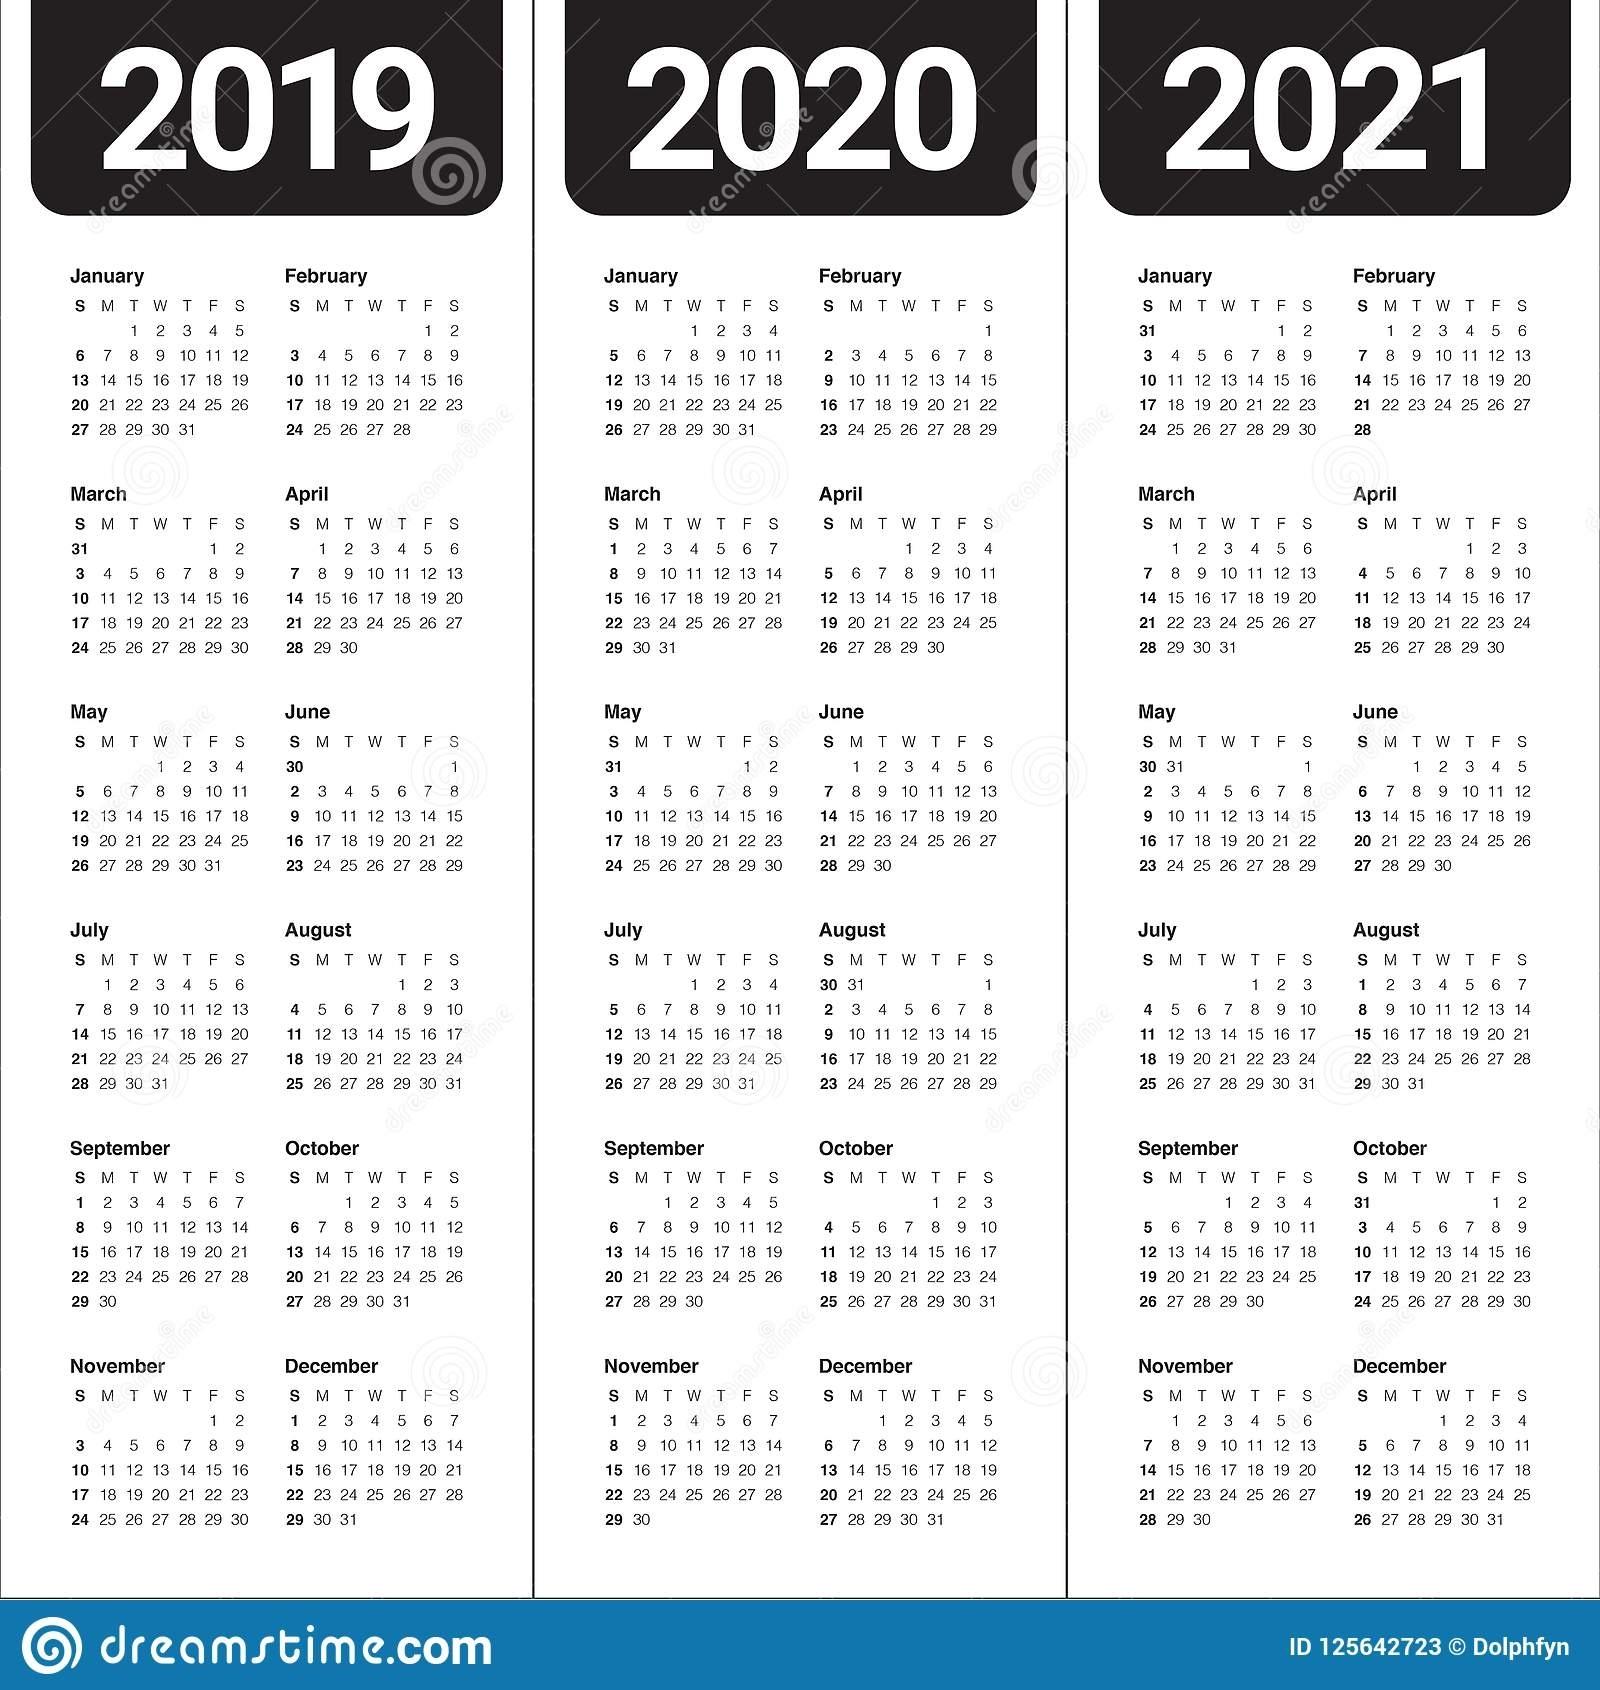 Year 2019 2020 2021 Calendar Vector Design Template Stock 2 Year Calendar 2020 And 2021